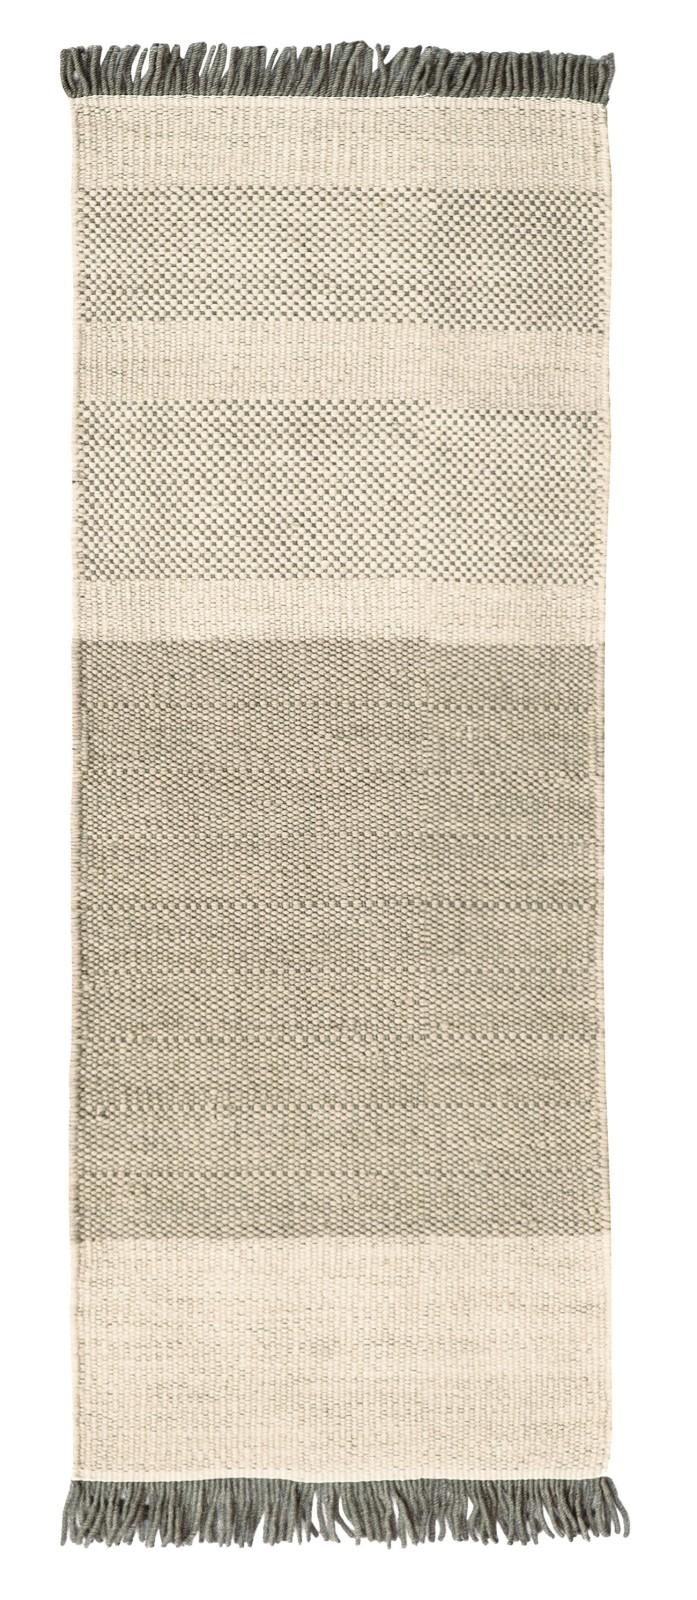 Tres Stripes Rug Pearl, 80 x 240 cm